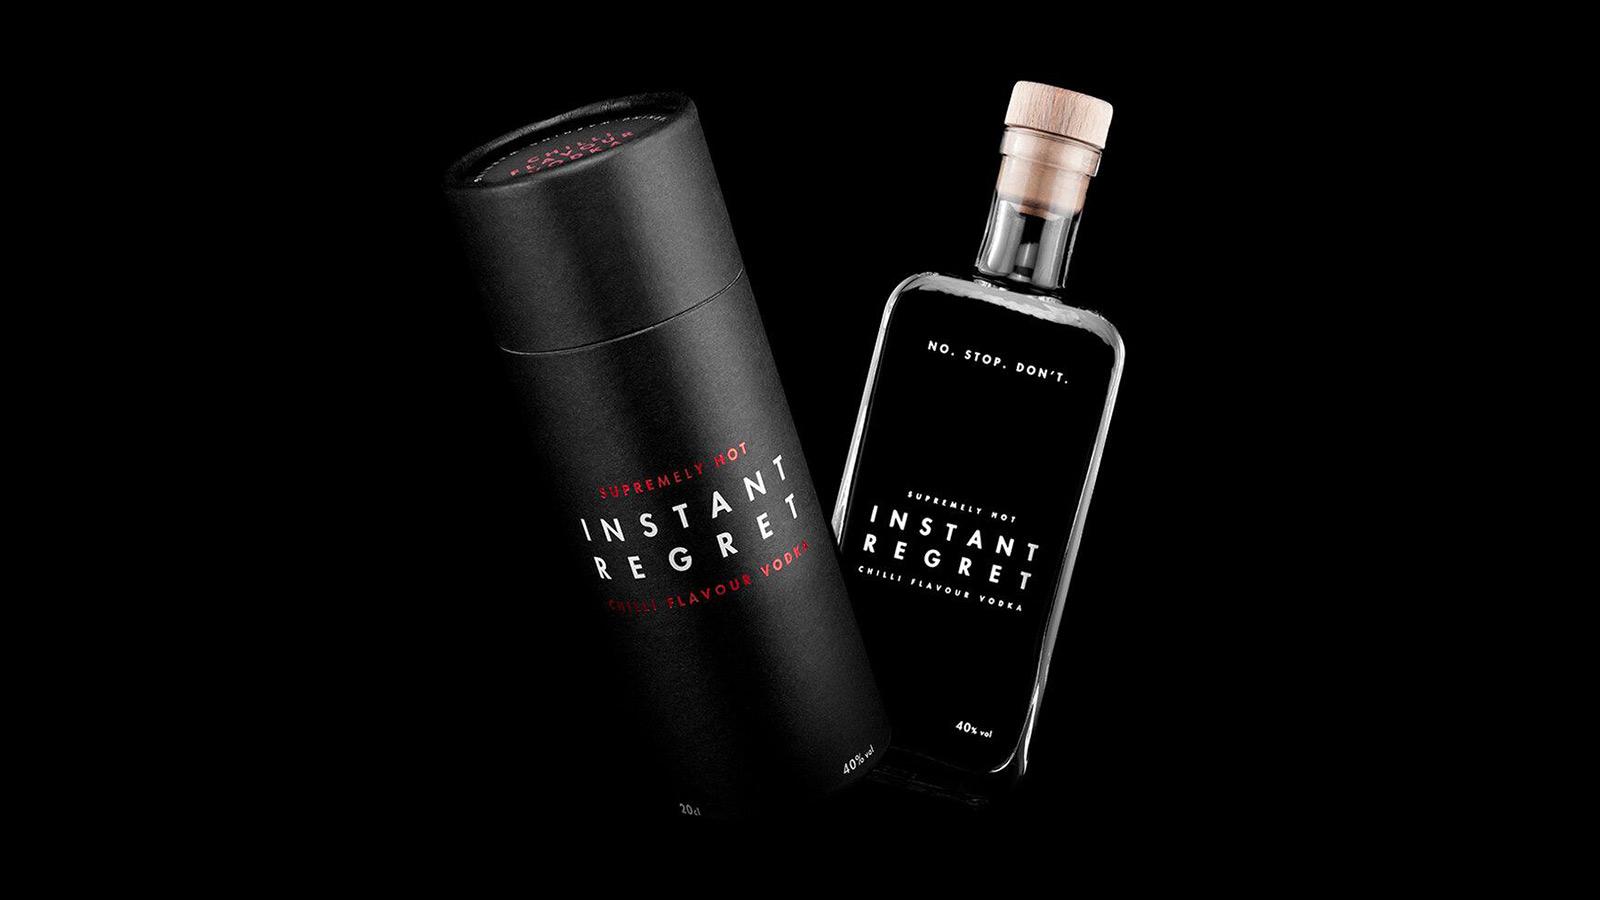 Instant Regret Vodka